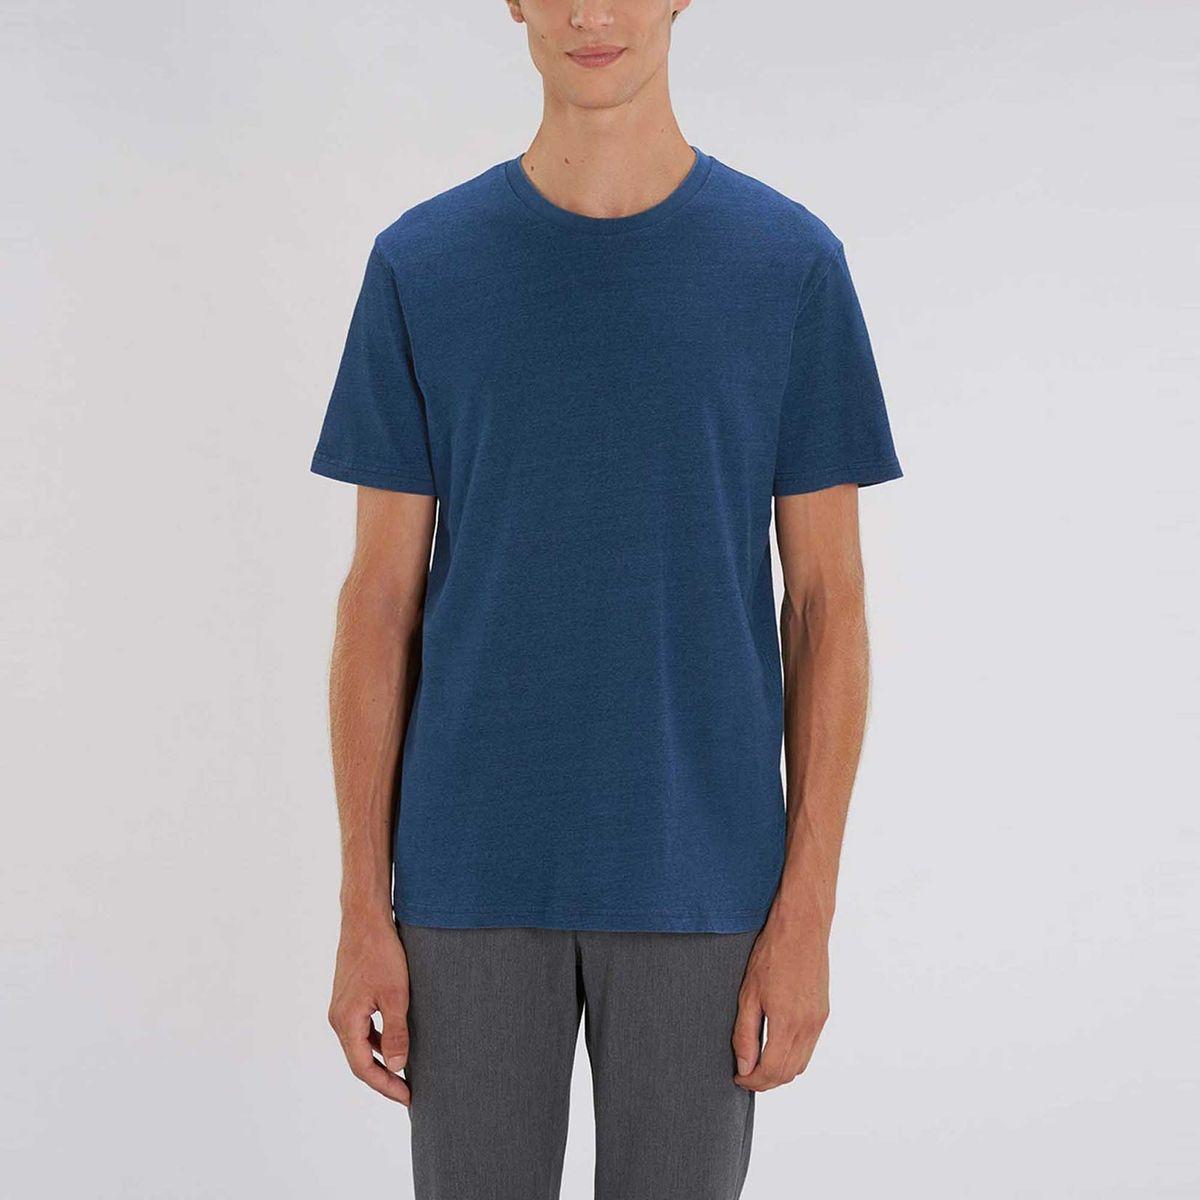 Tee shirt denim manches courtes col rond coton bio  Cozumel